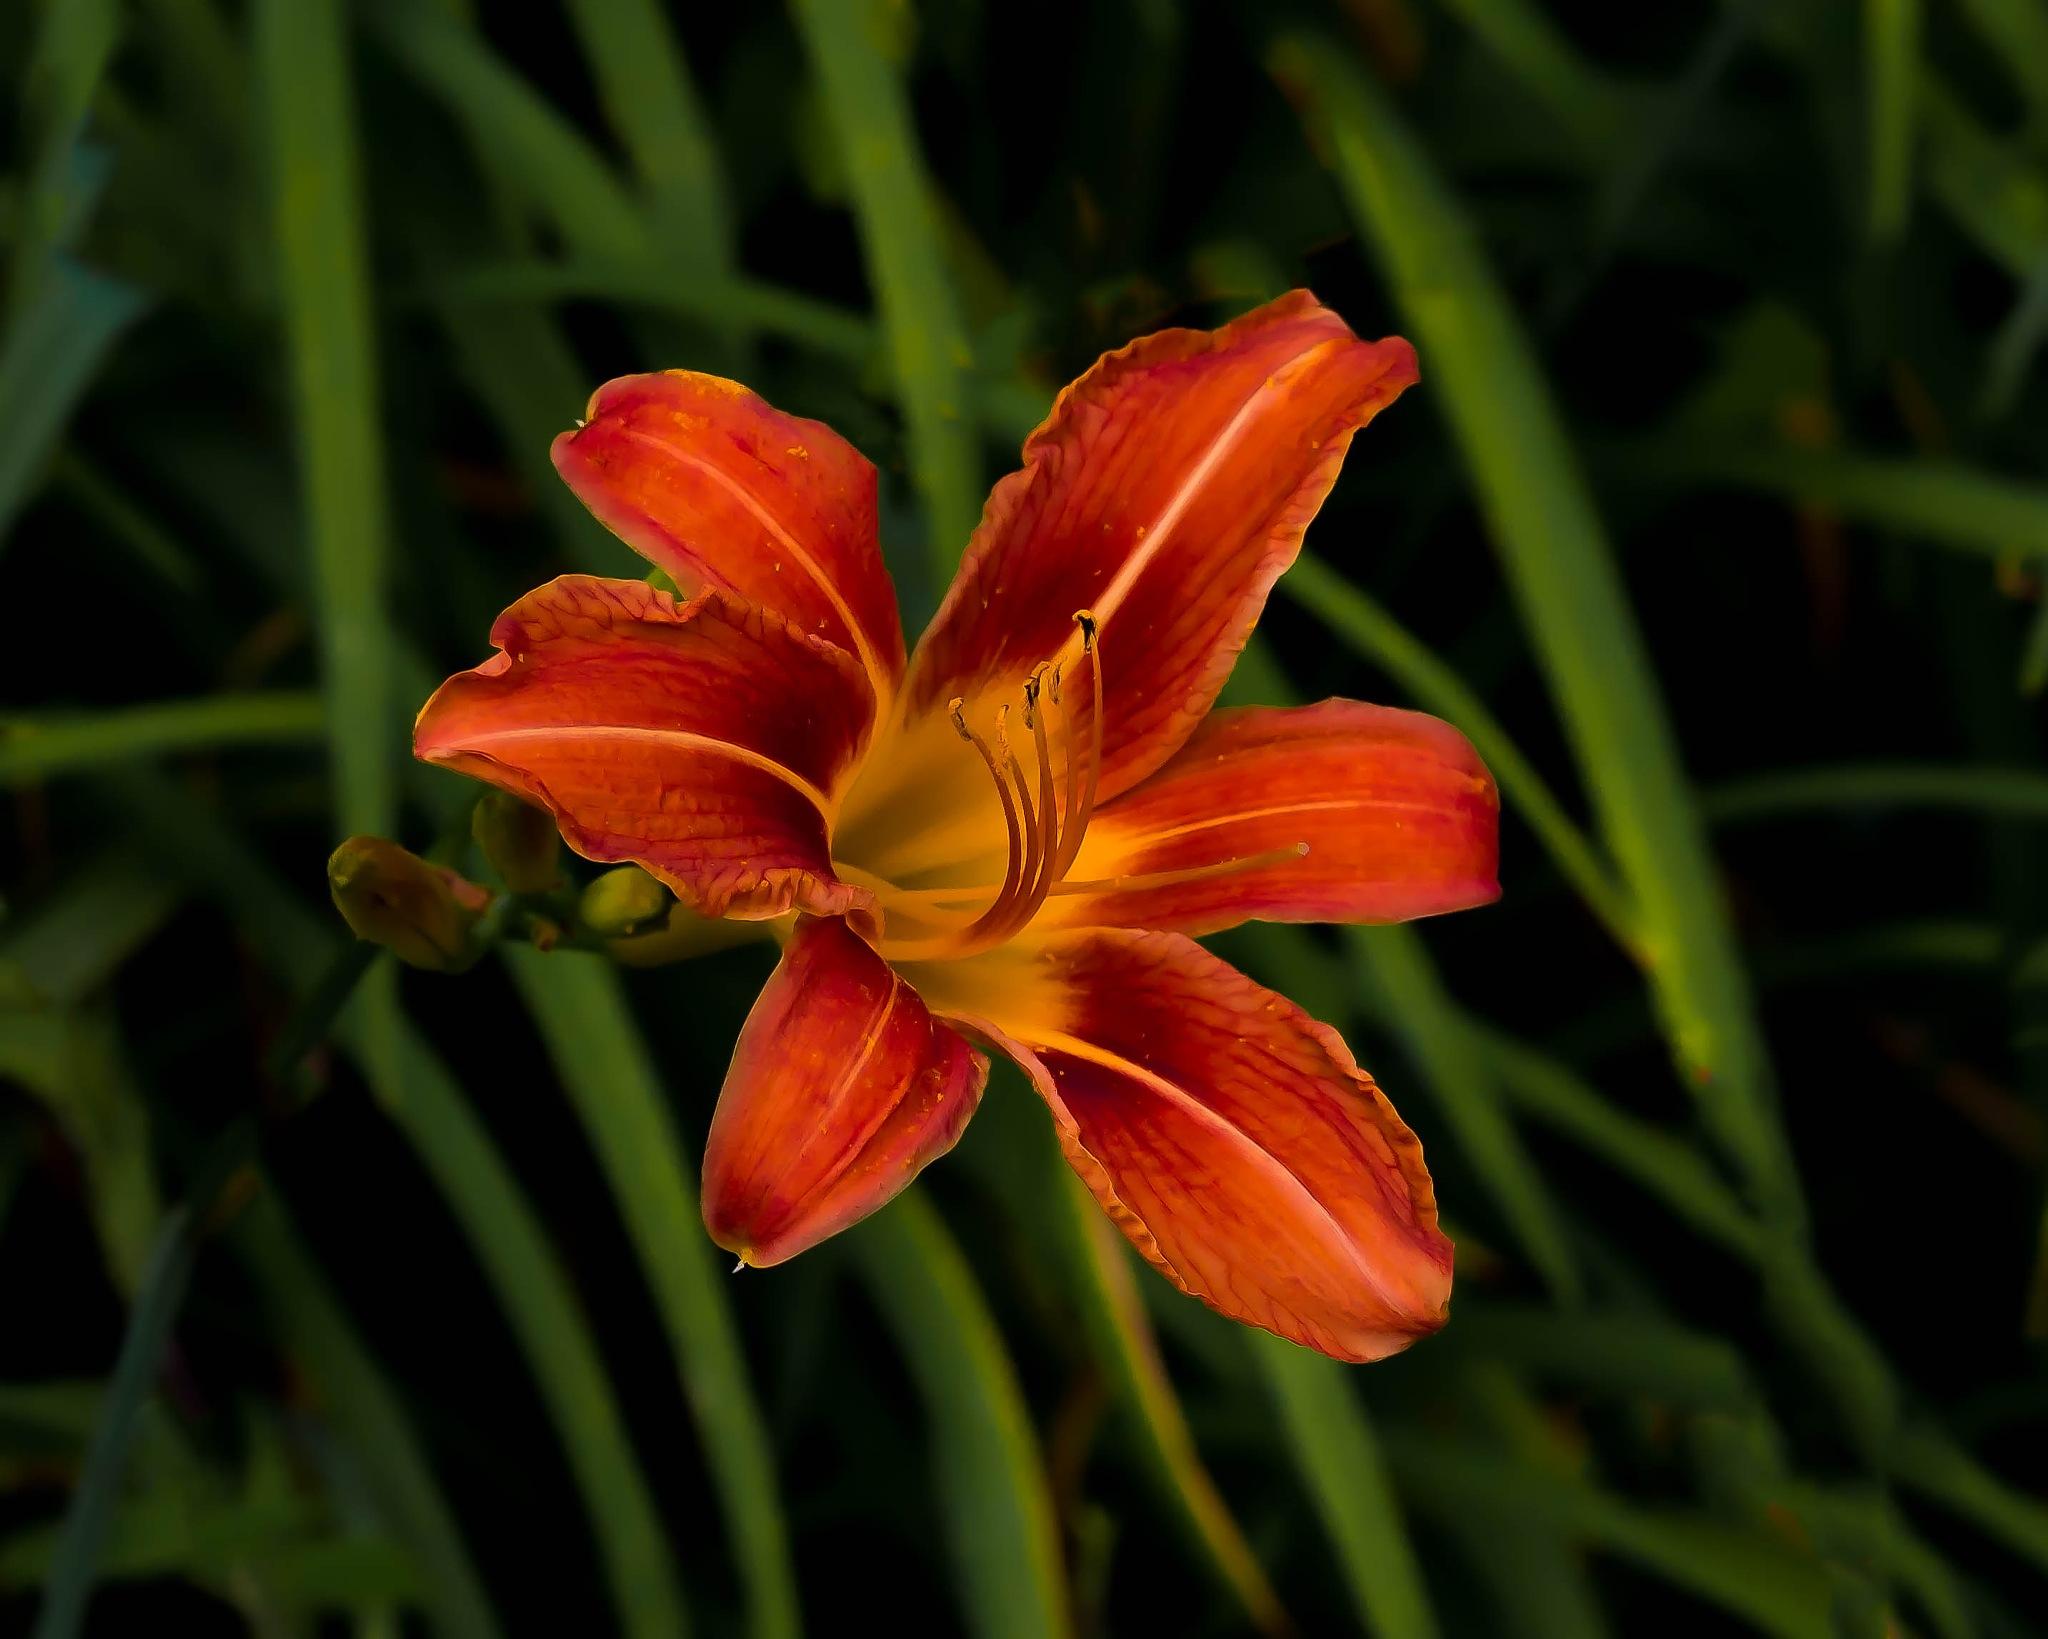 Roadside Tiger Lily by Edward Brown